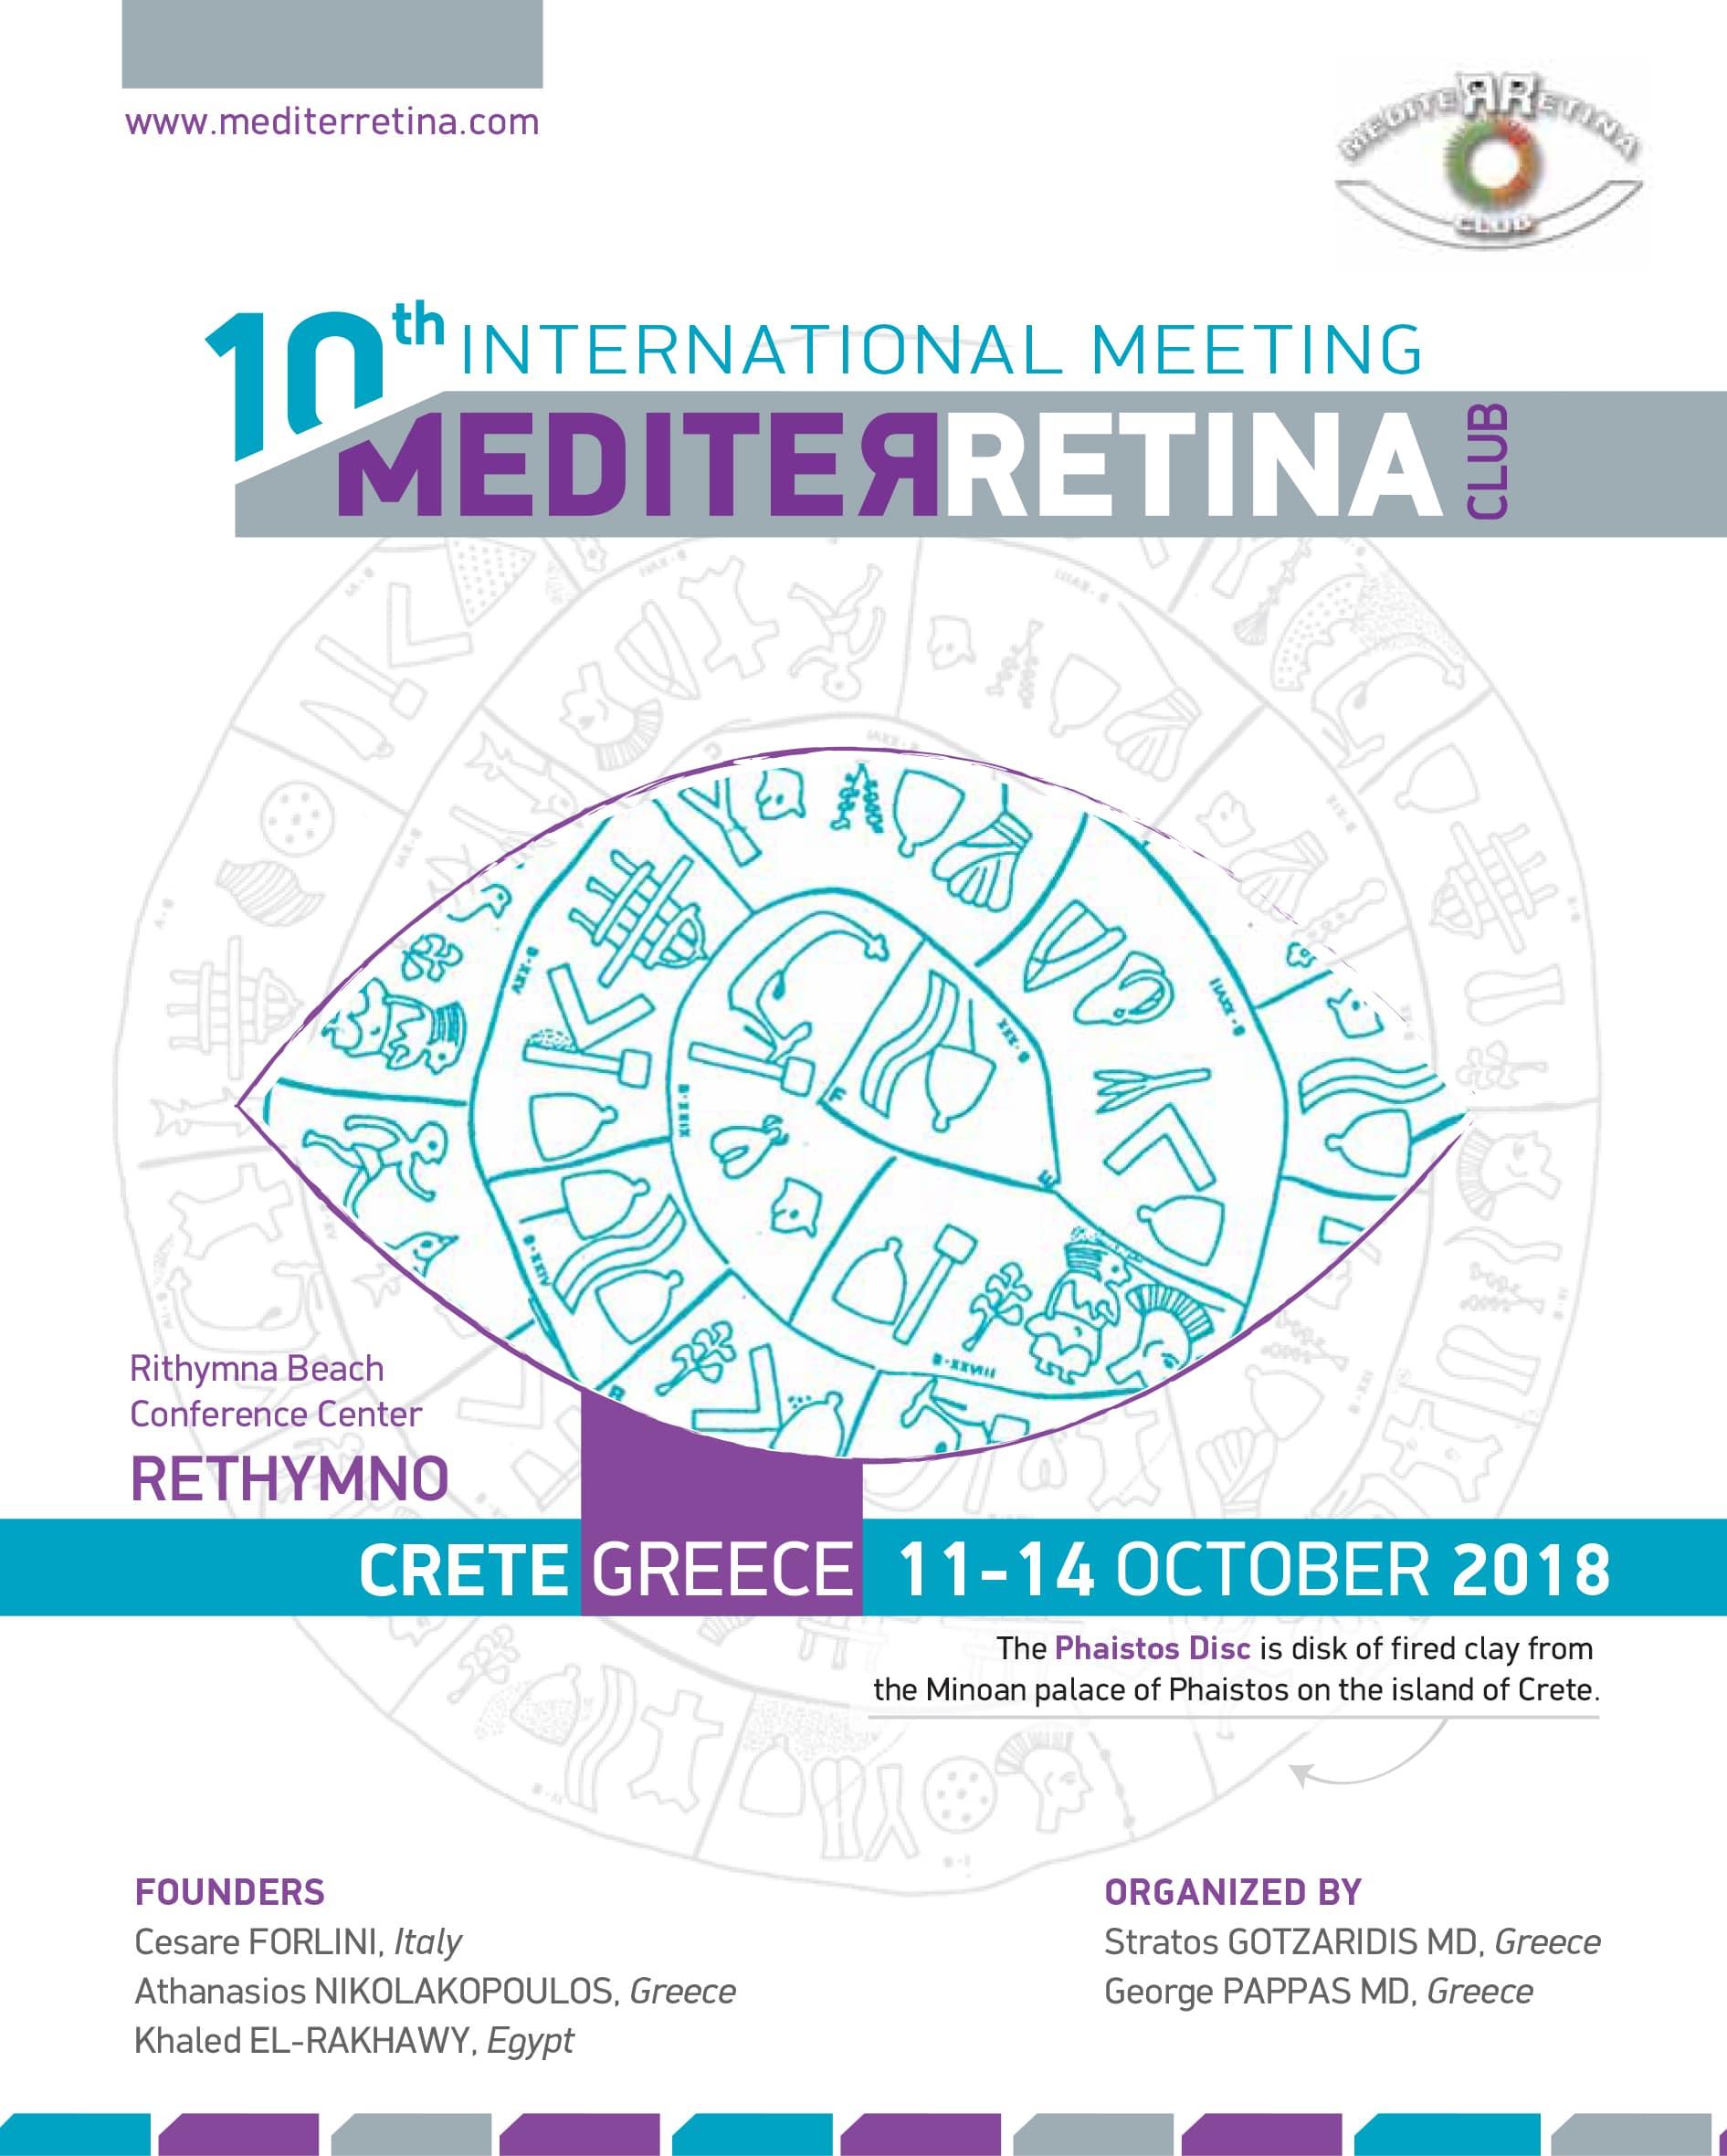 10th International Meeting Mediterretina | Era Ltd. Congress Organizer